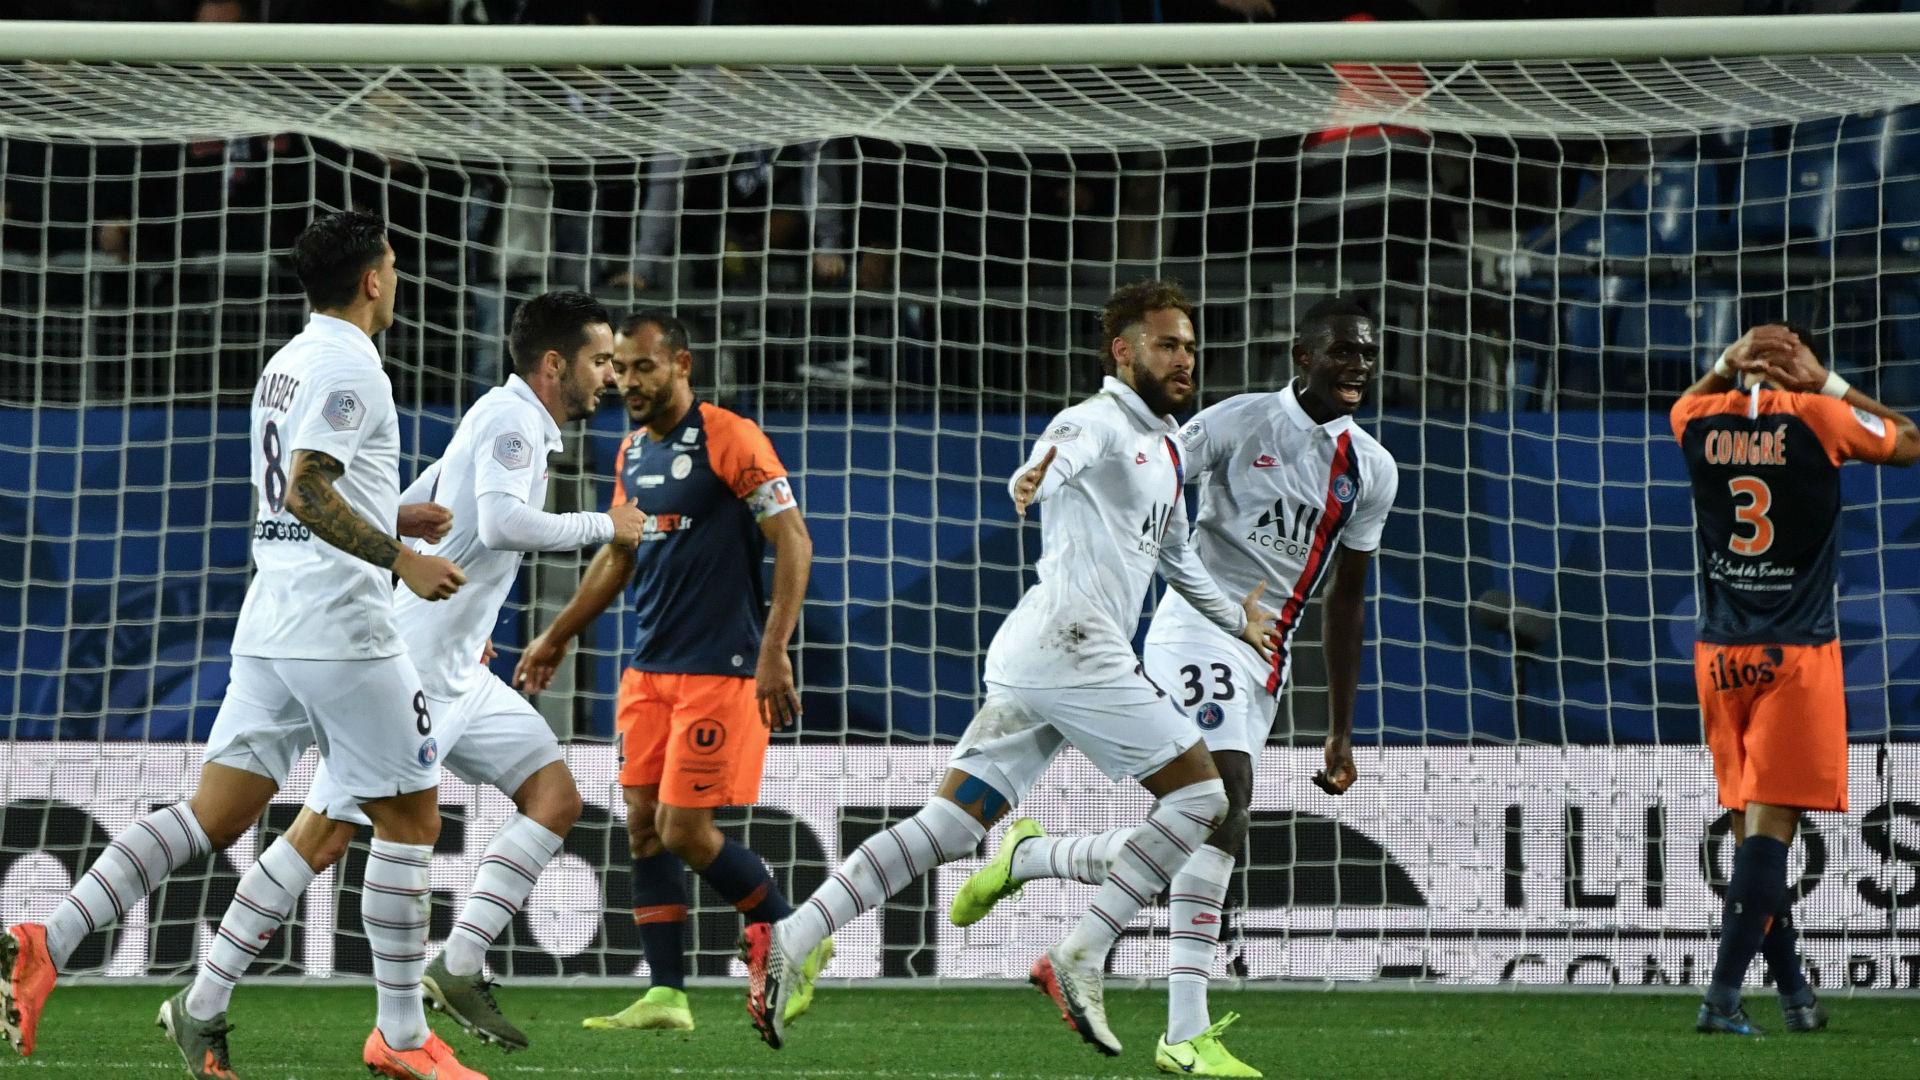 Mauro Icardi sentenció el triunfo del PSG con una terrible gol